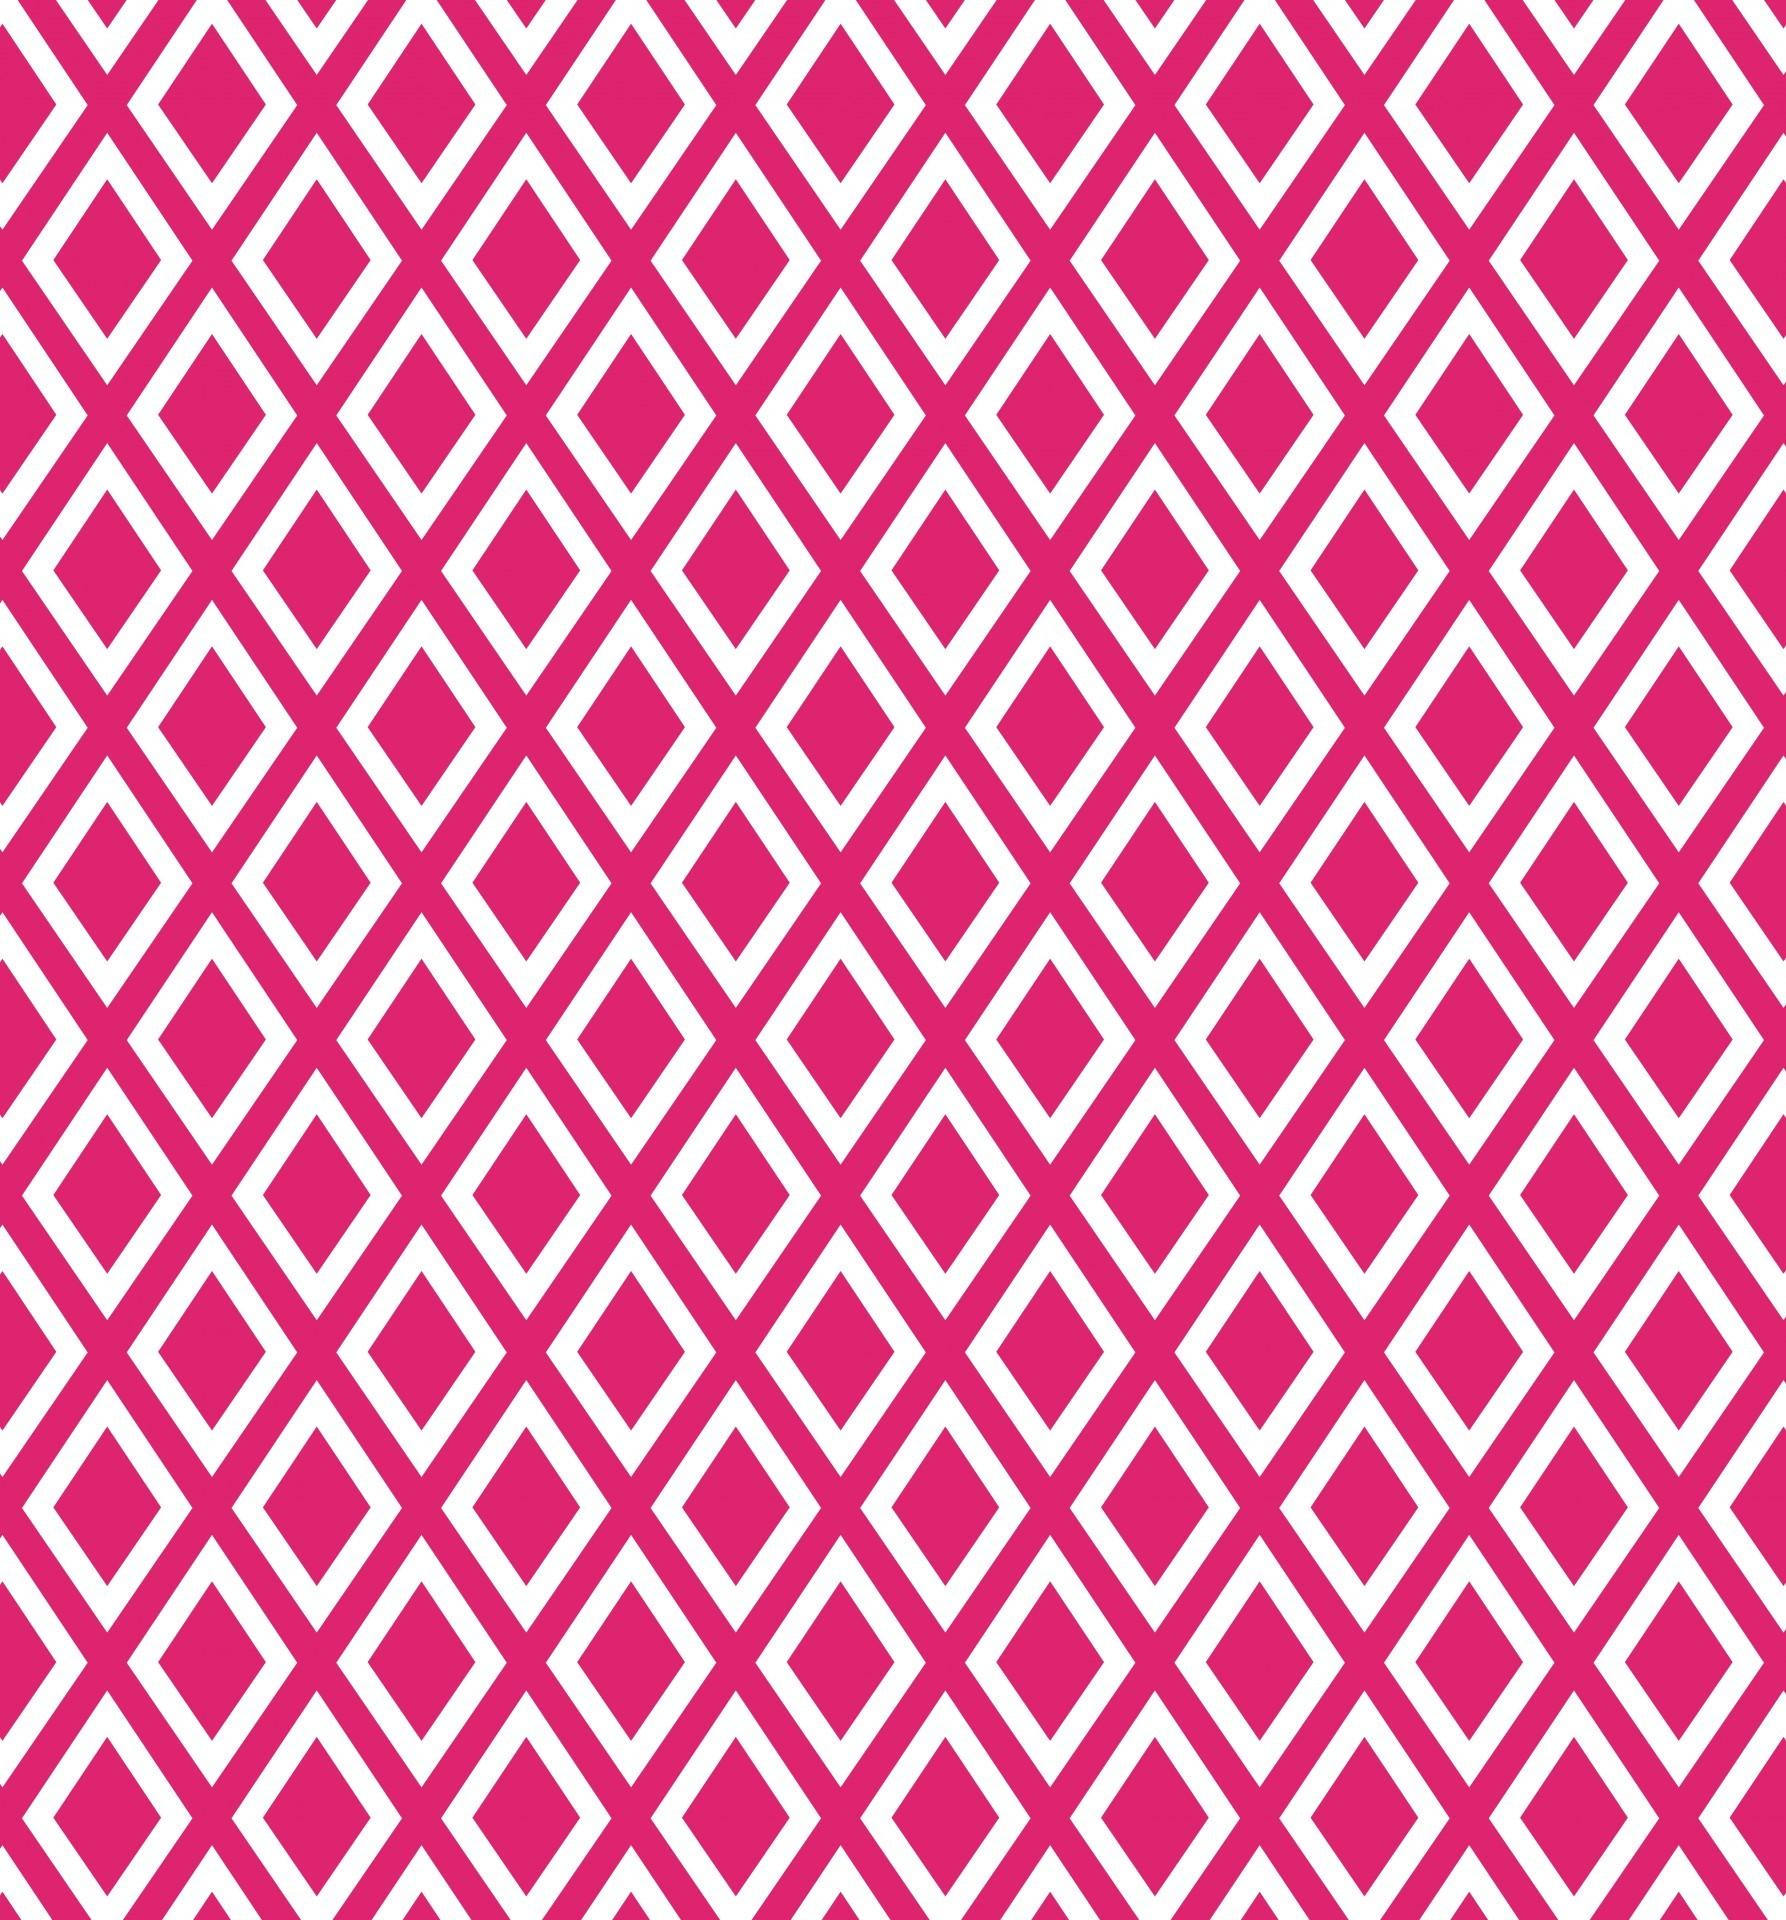 Diamonds Pink White Background